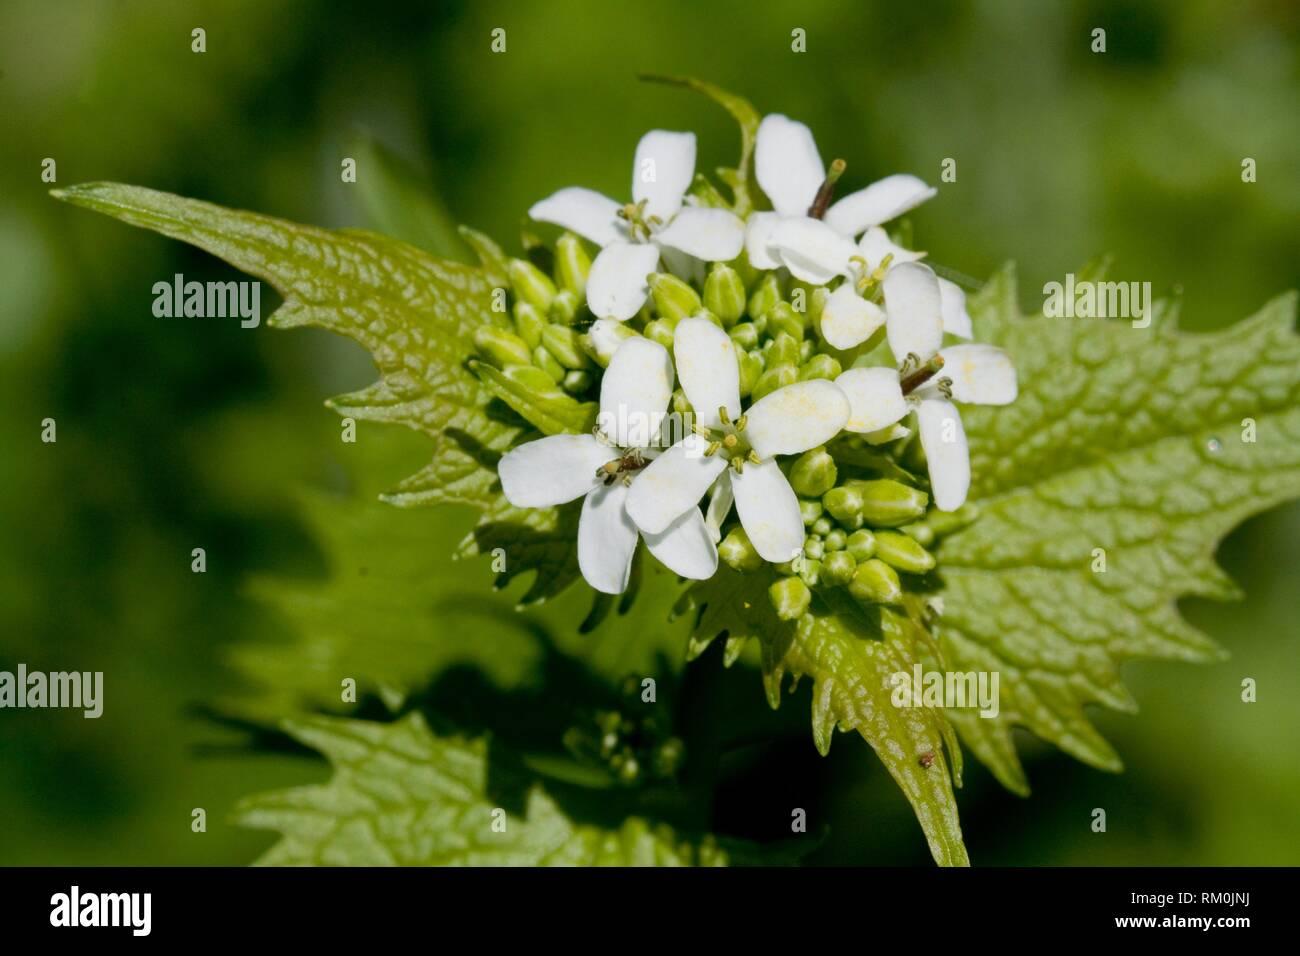 Alliaria petiolata ajo, Mostaza. Foto de stock